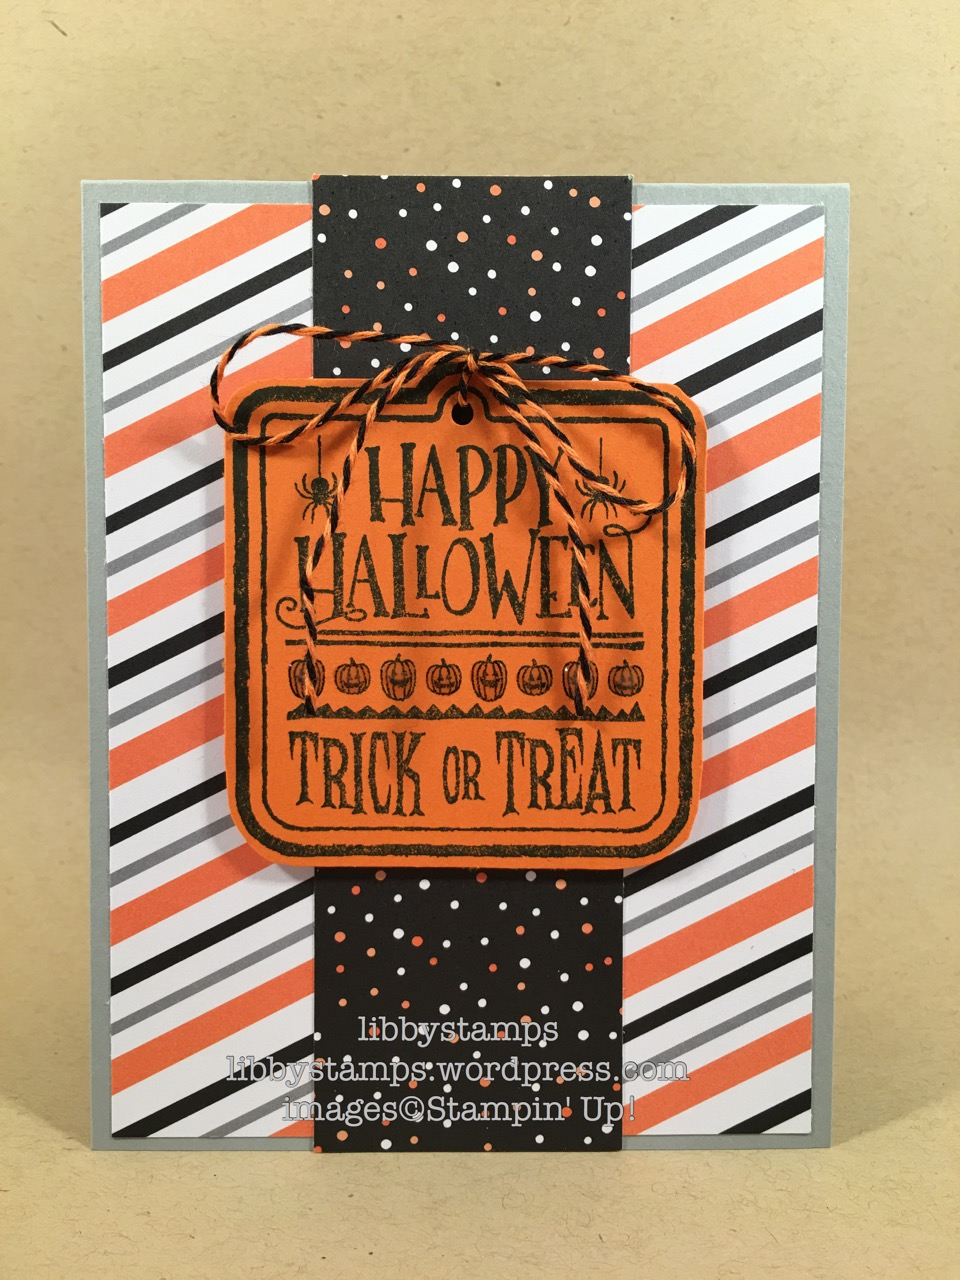 libbystamps, stampin up, Halloween Treat Stamp, Halloween Night Specialty DSP, Halloween Night Baker's Twine, Halloween, Nacho Average Challenges